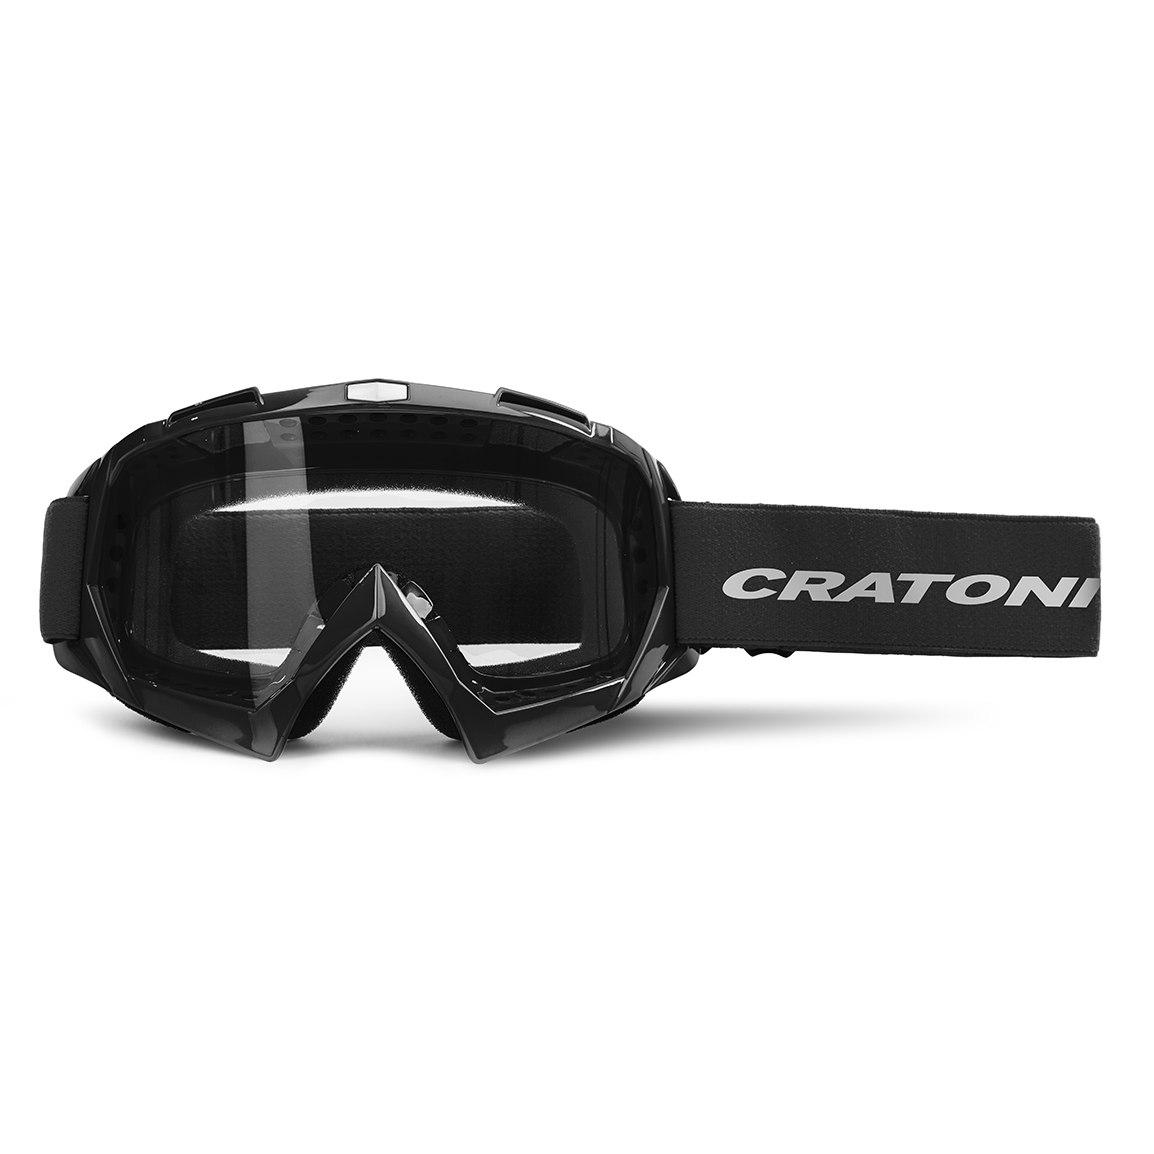 CRATONI C-Rage Goggle - black glossy / clear